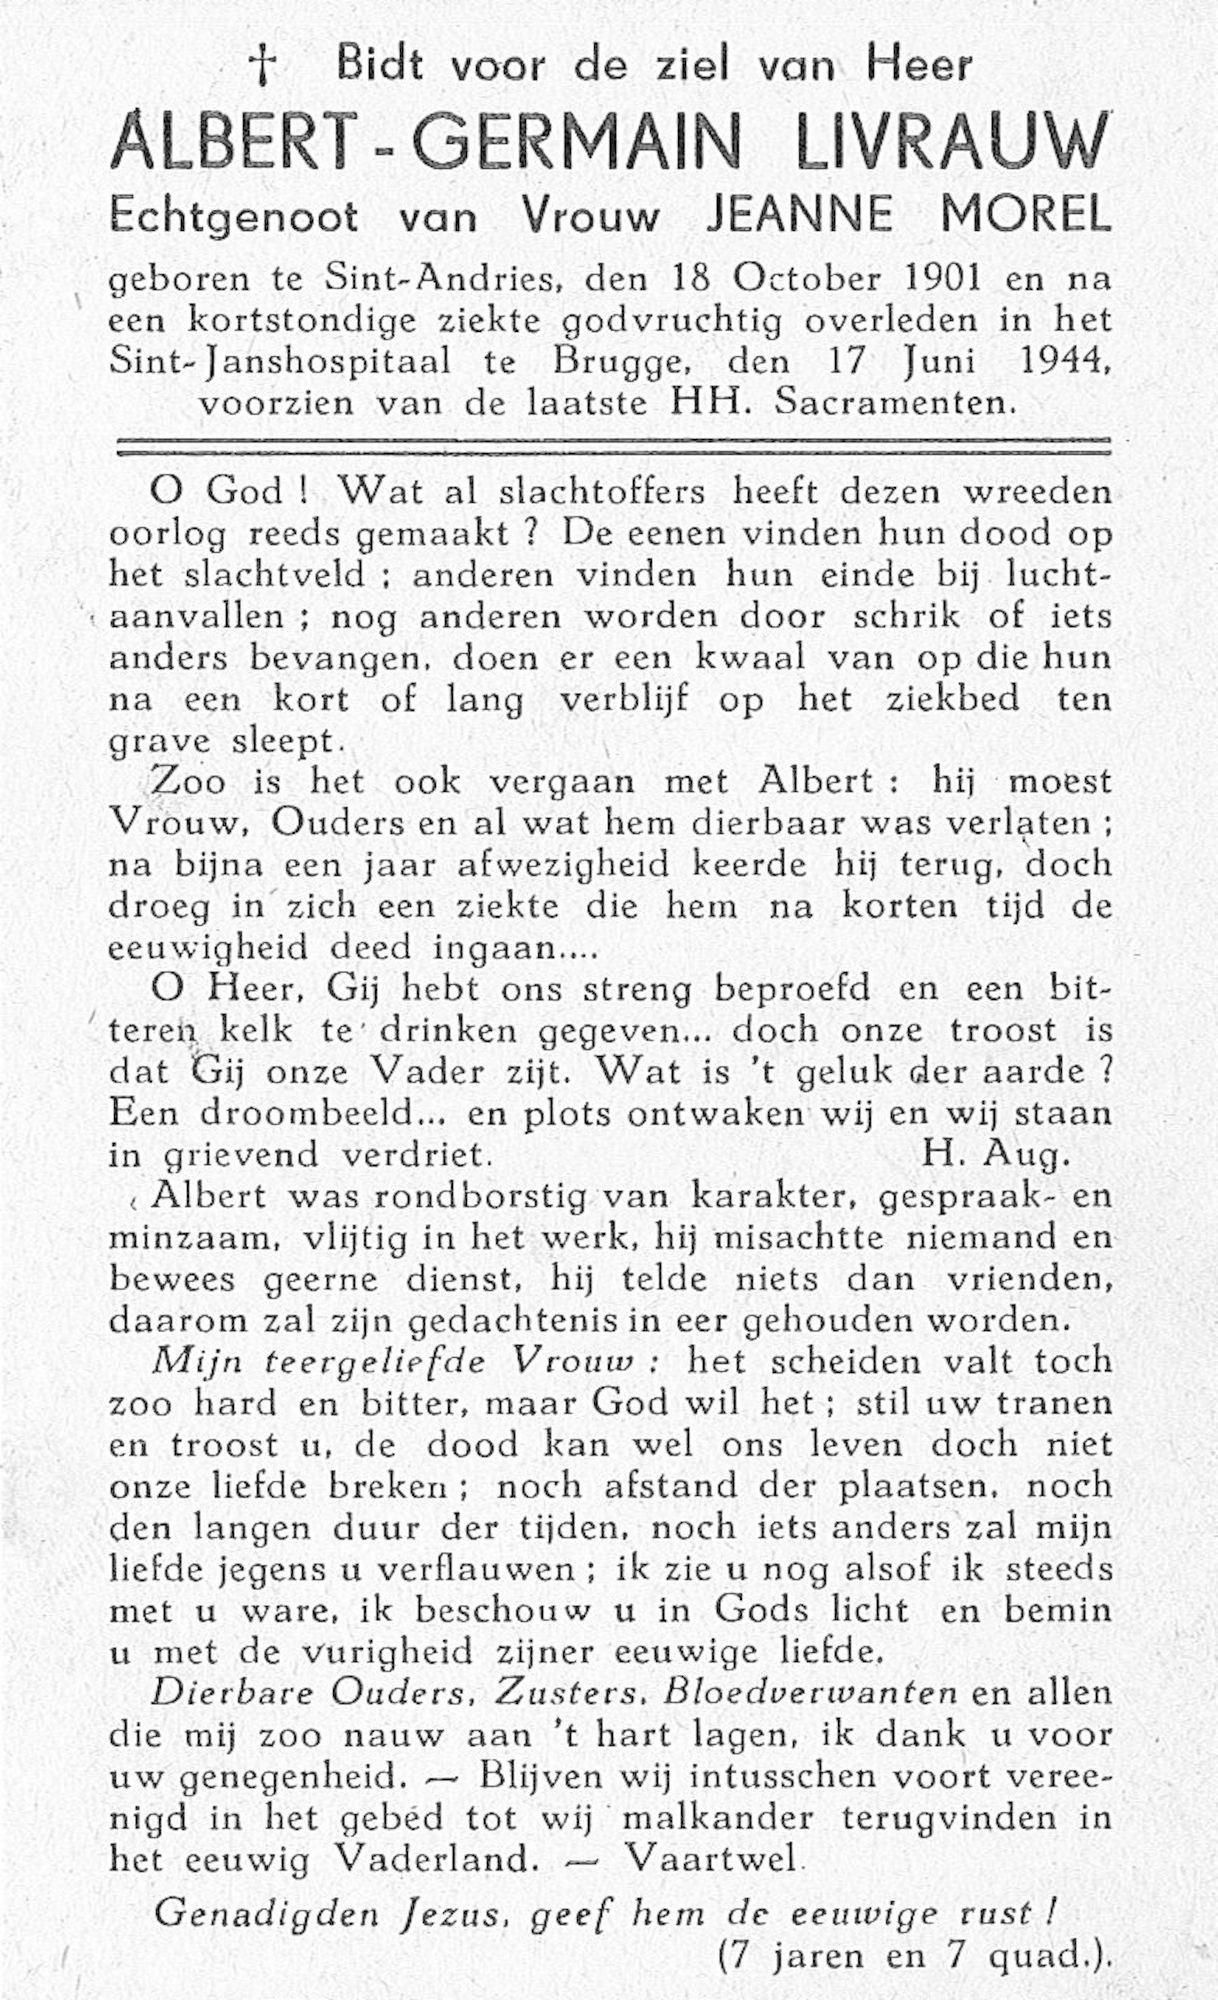 Albert-Germain Livrauw